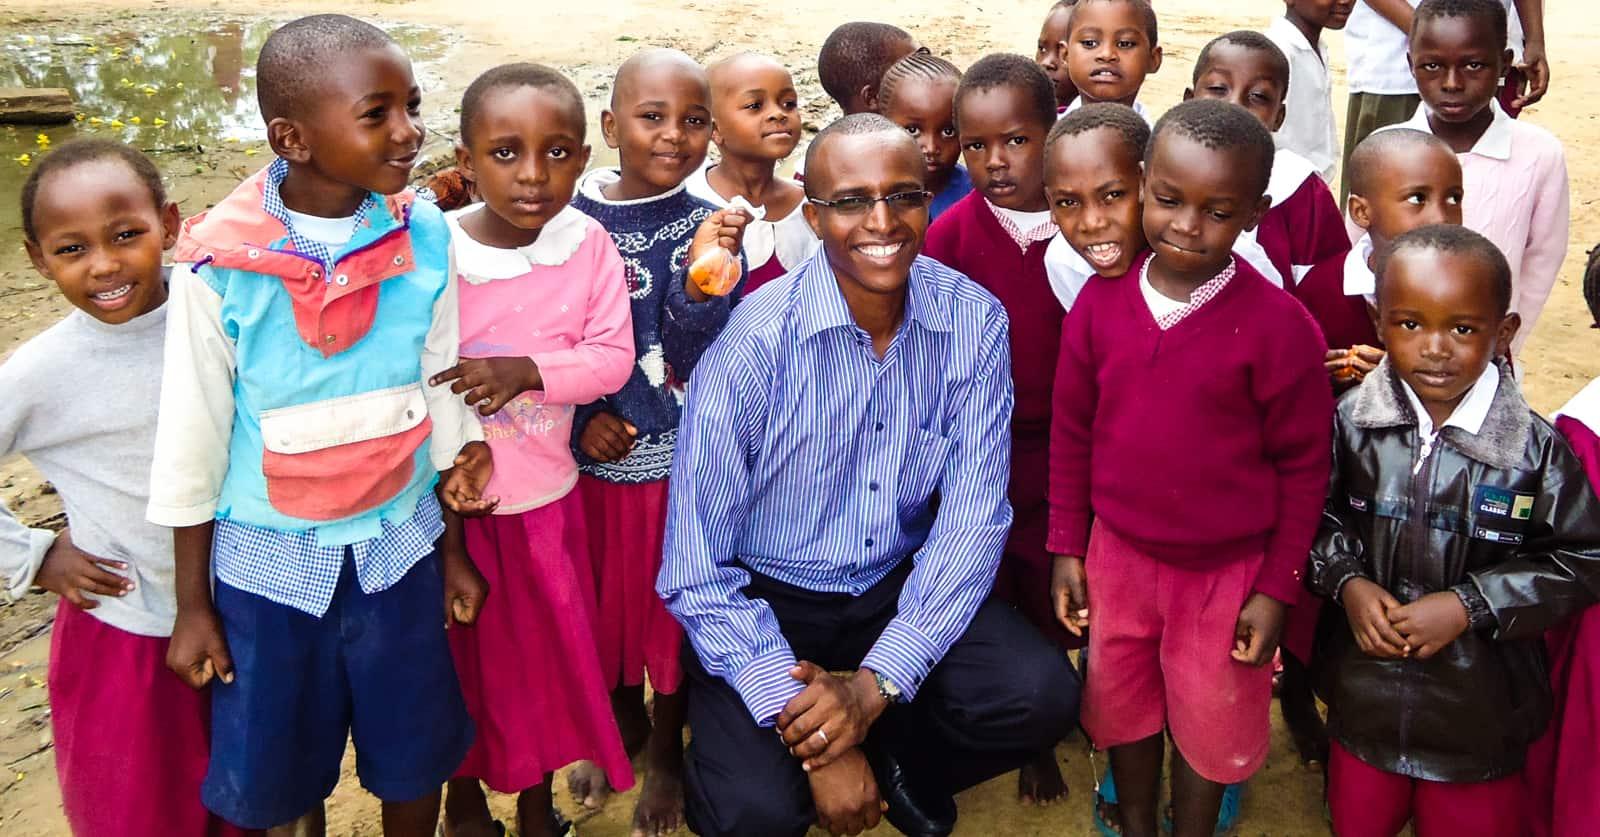 Joel Macharia: The Best Wealth Kenya Has is its Human Capital